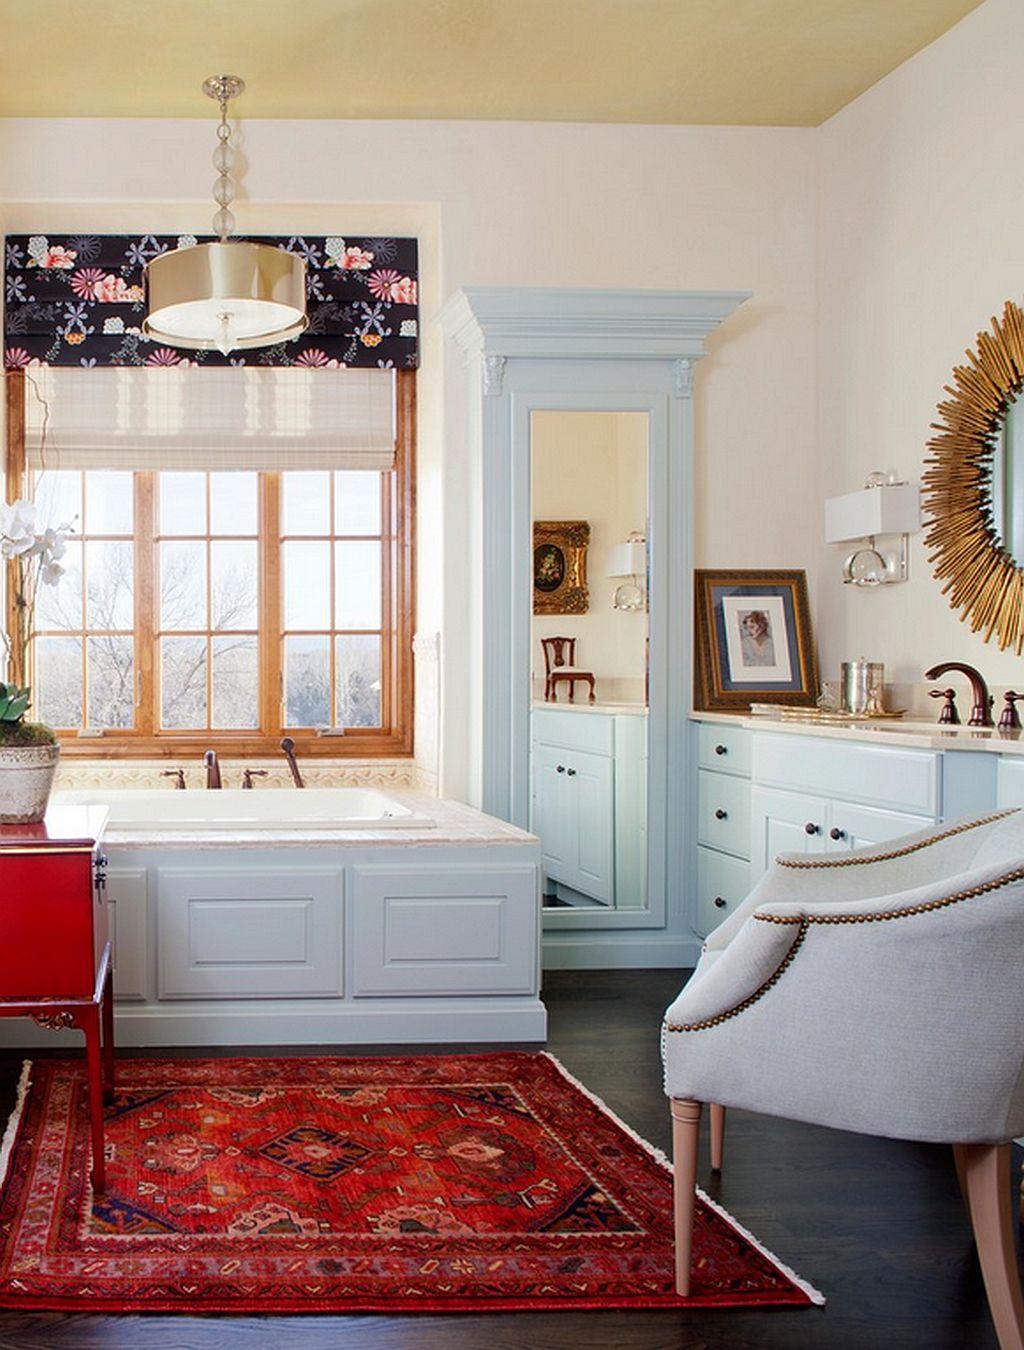 adelaparvu.com casa rustic clasica designer Andrea Schumacher (8)